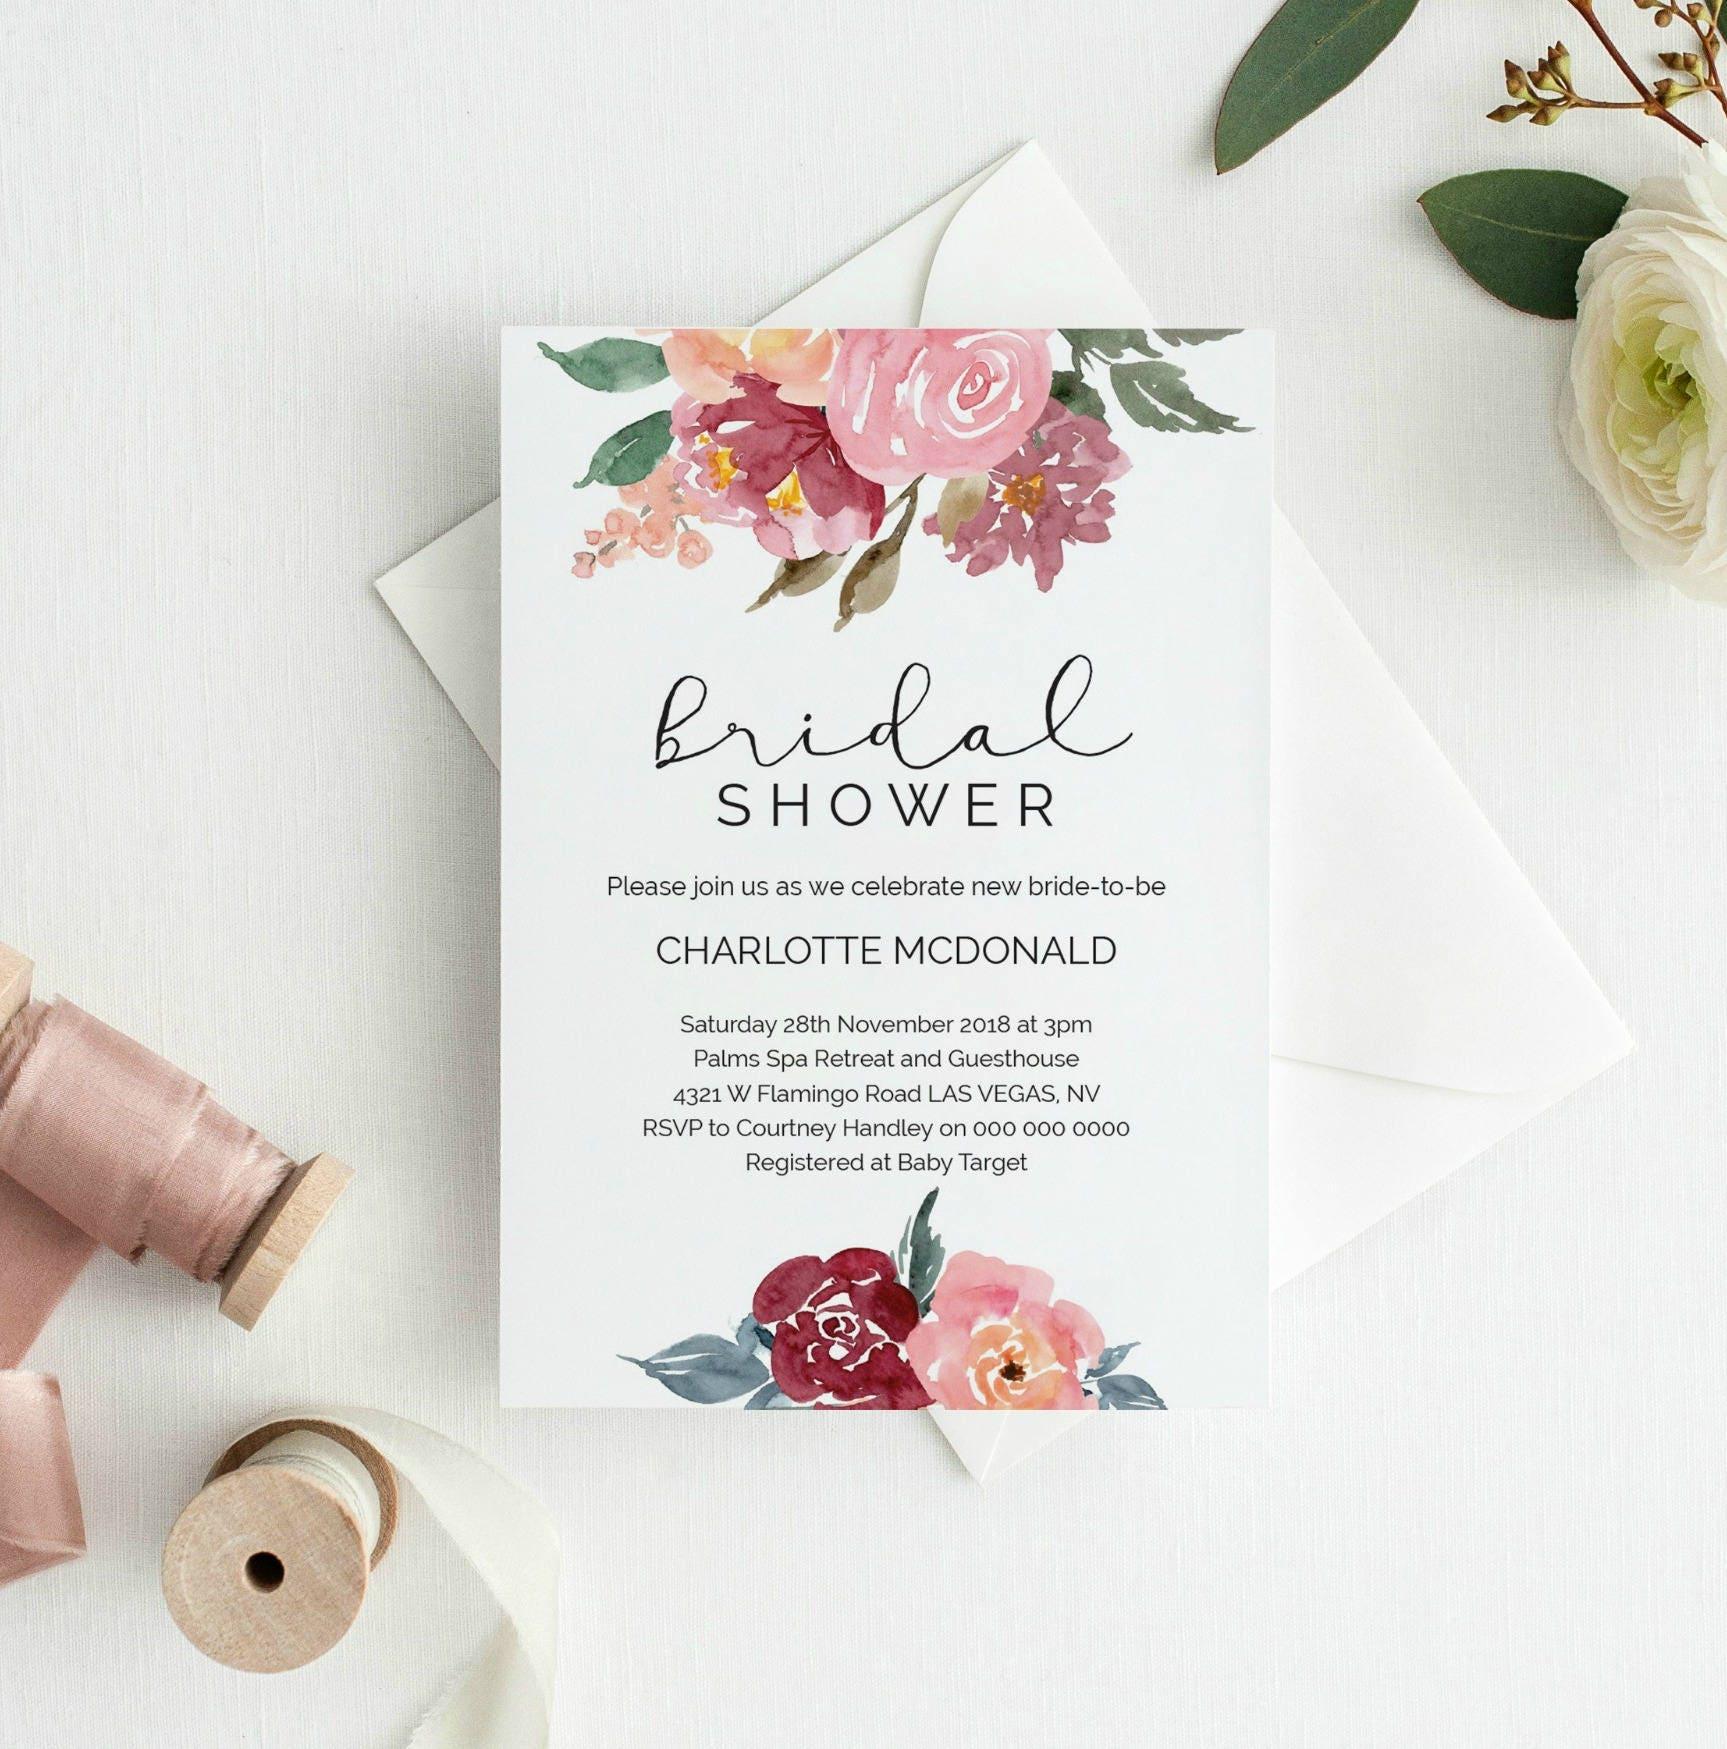 Bridal Shower Invitation Printable Burgandy Floral Invitation | Etsy